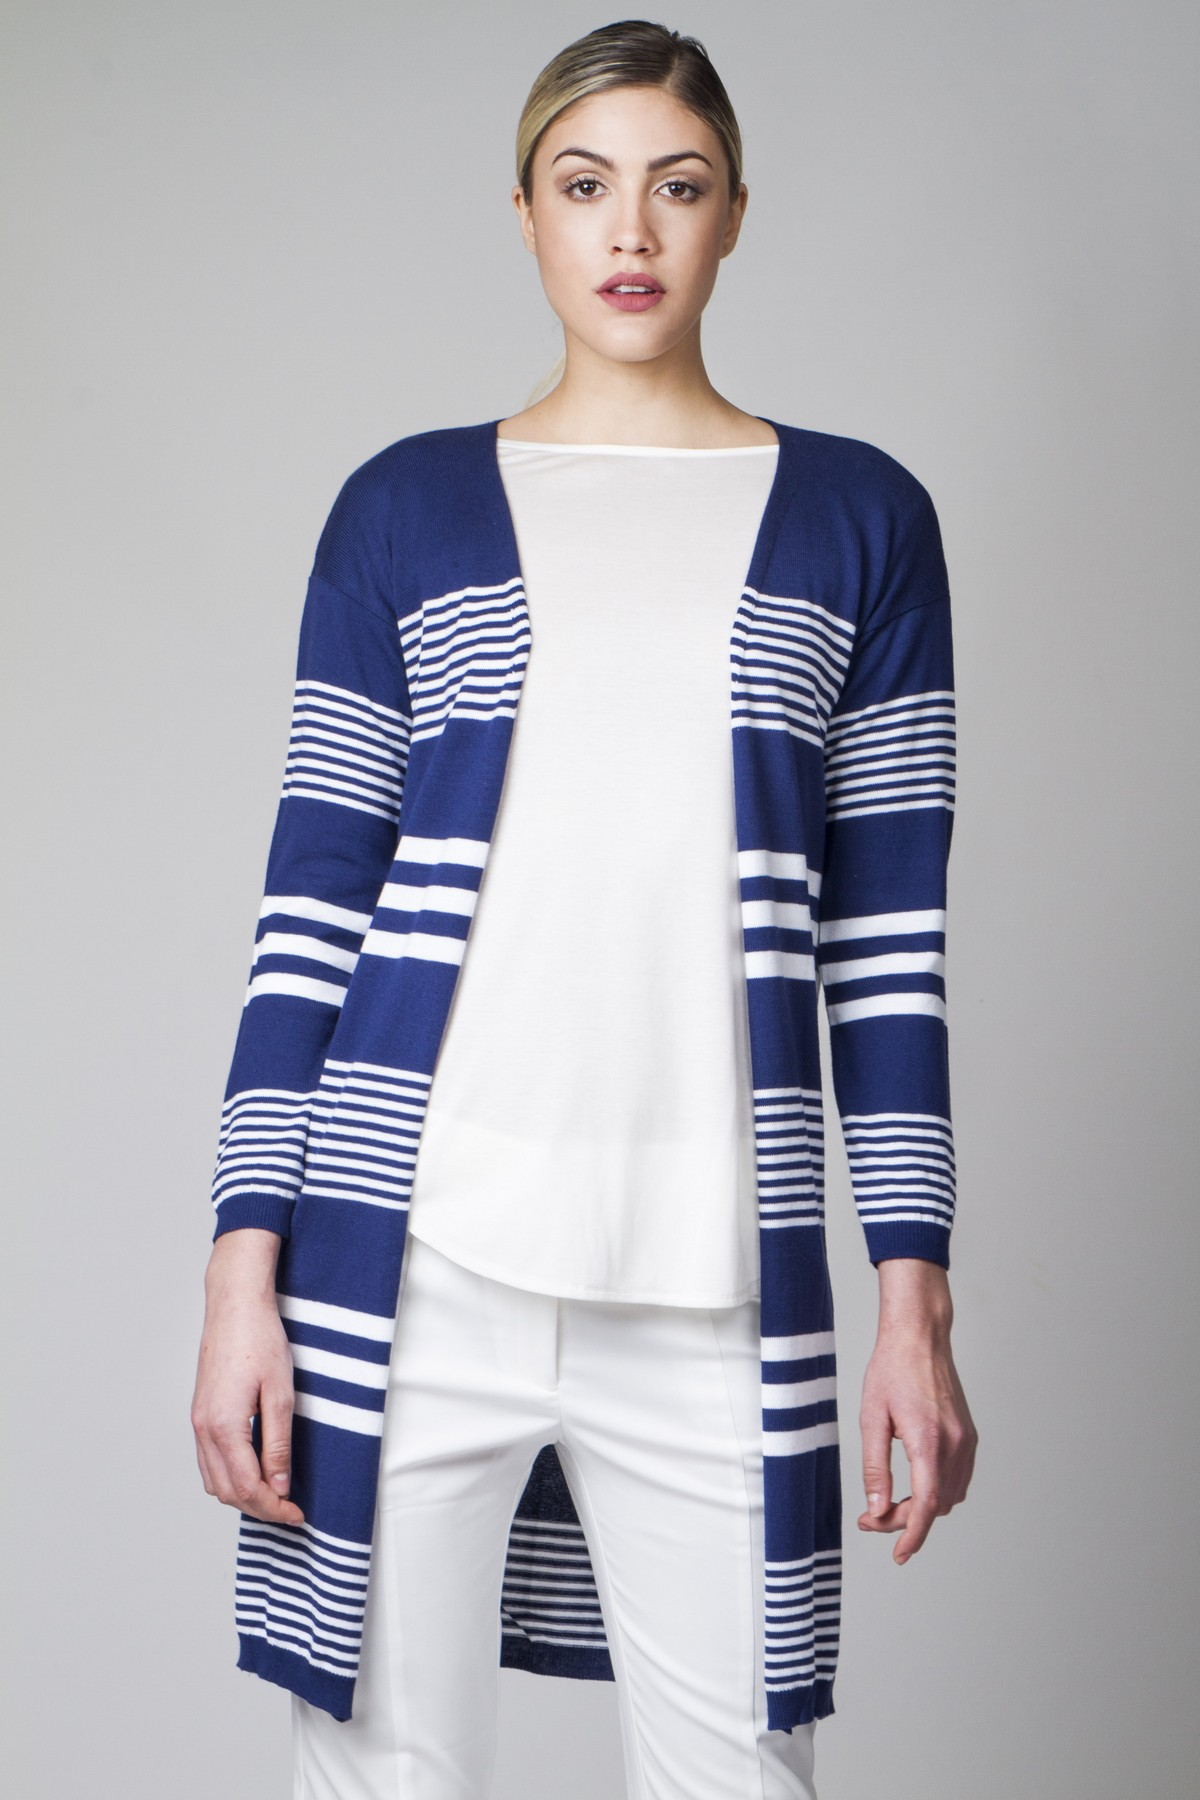 Longline striped cardigan - aggel.eu